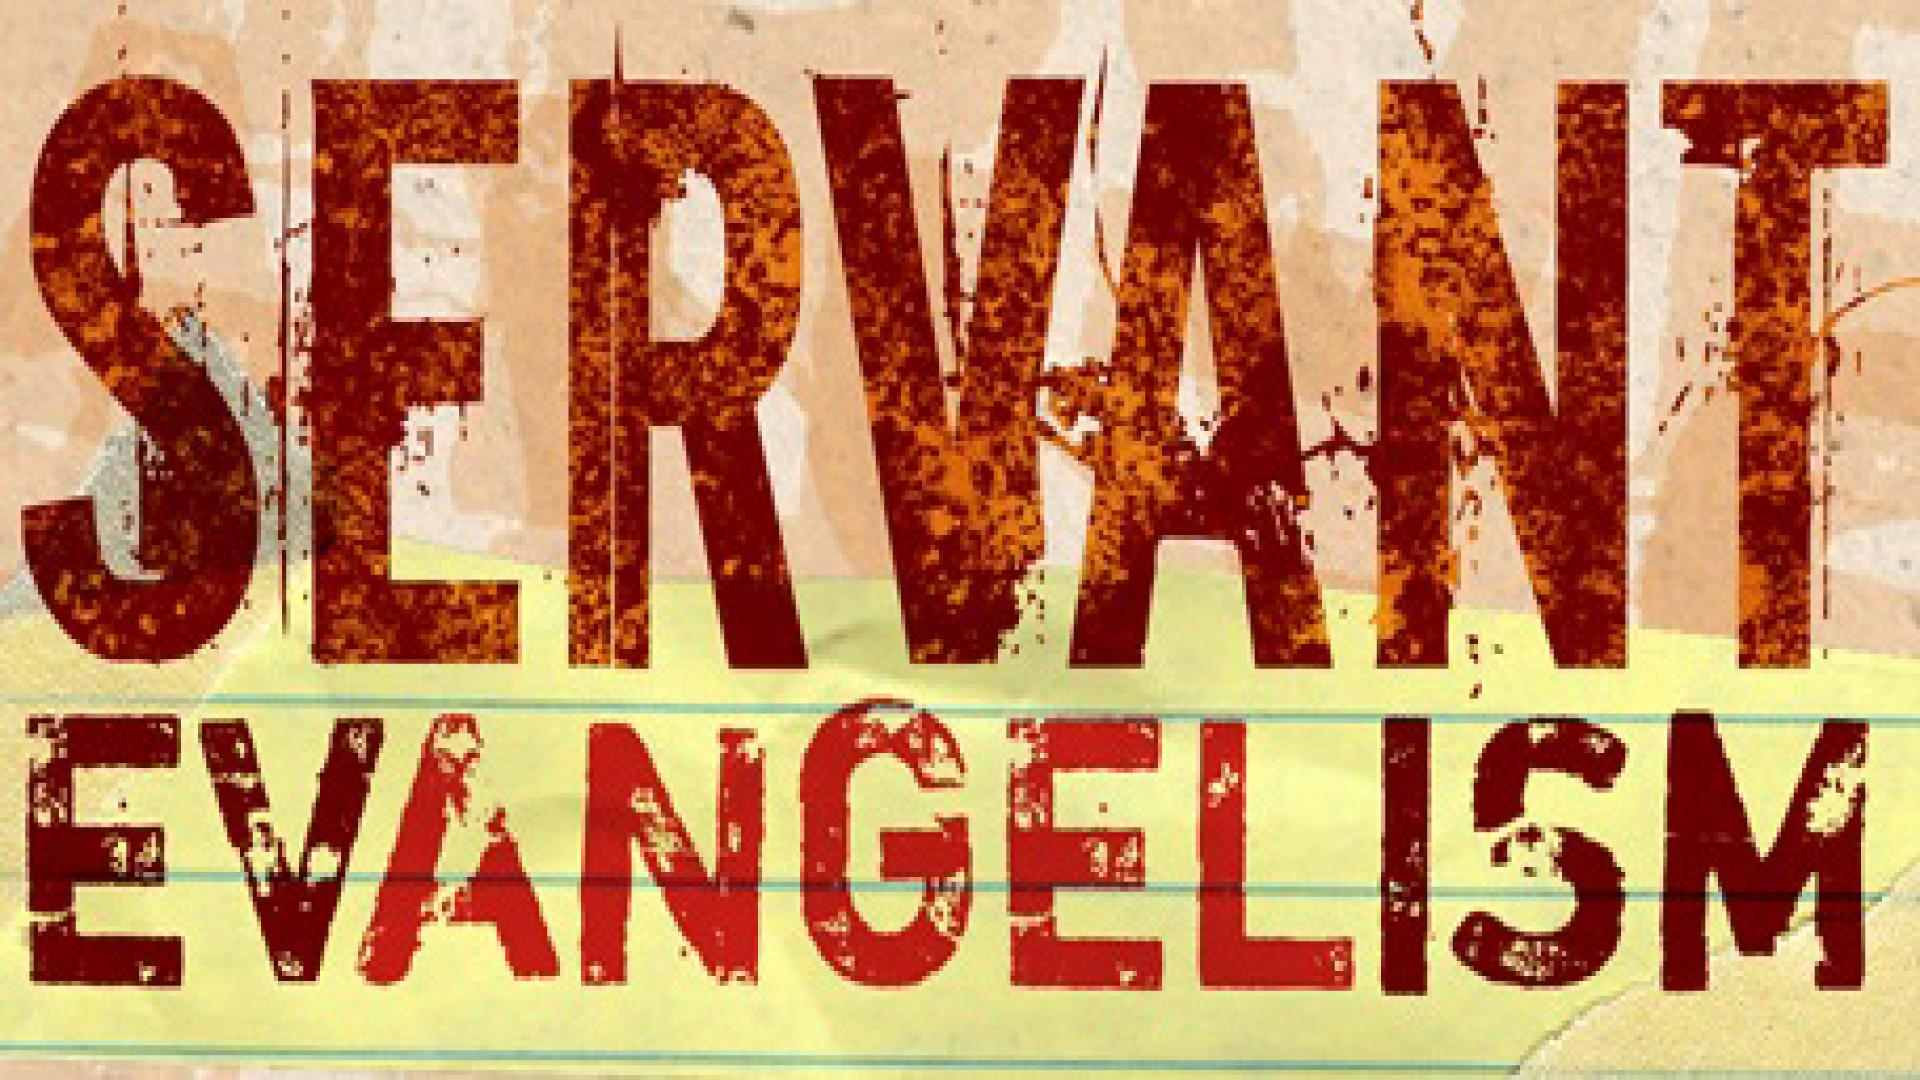 Servant-Evangelism-1920x1080